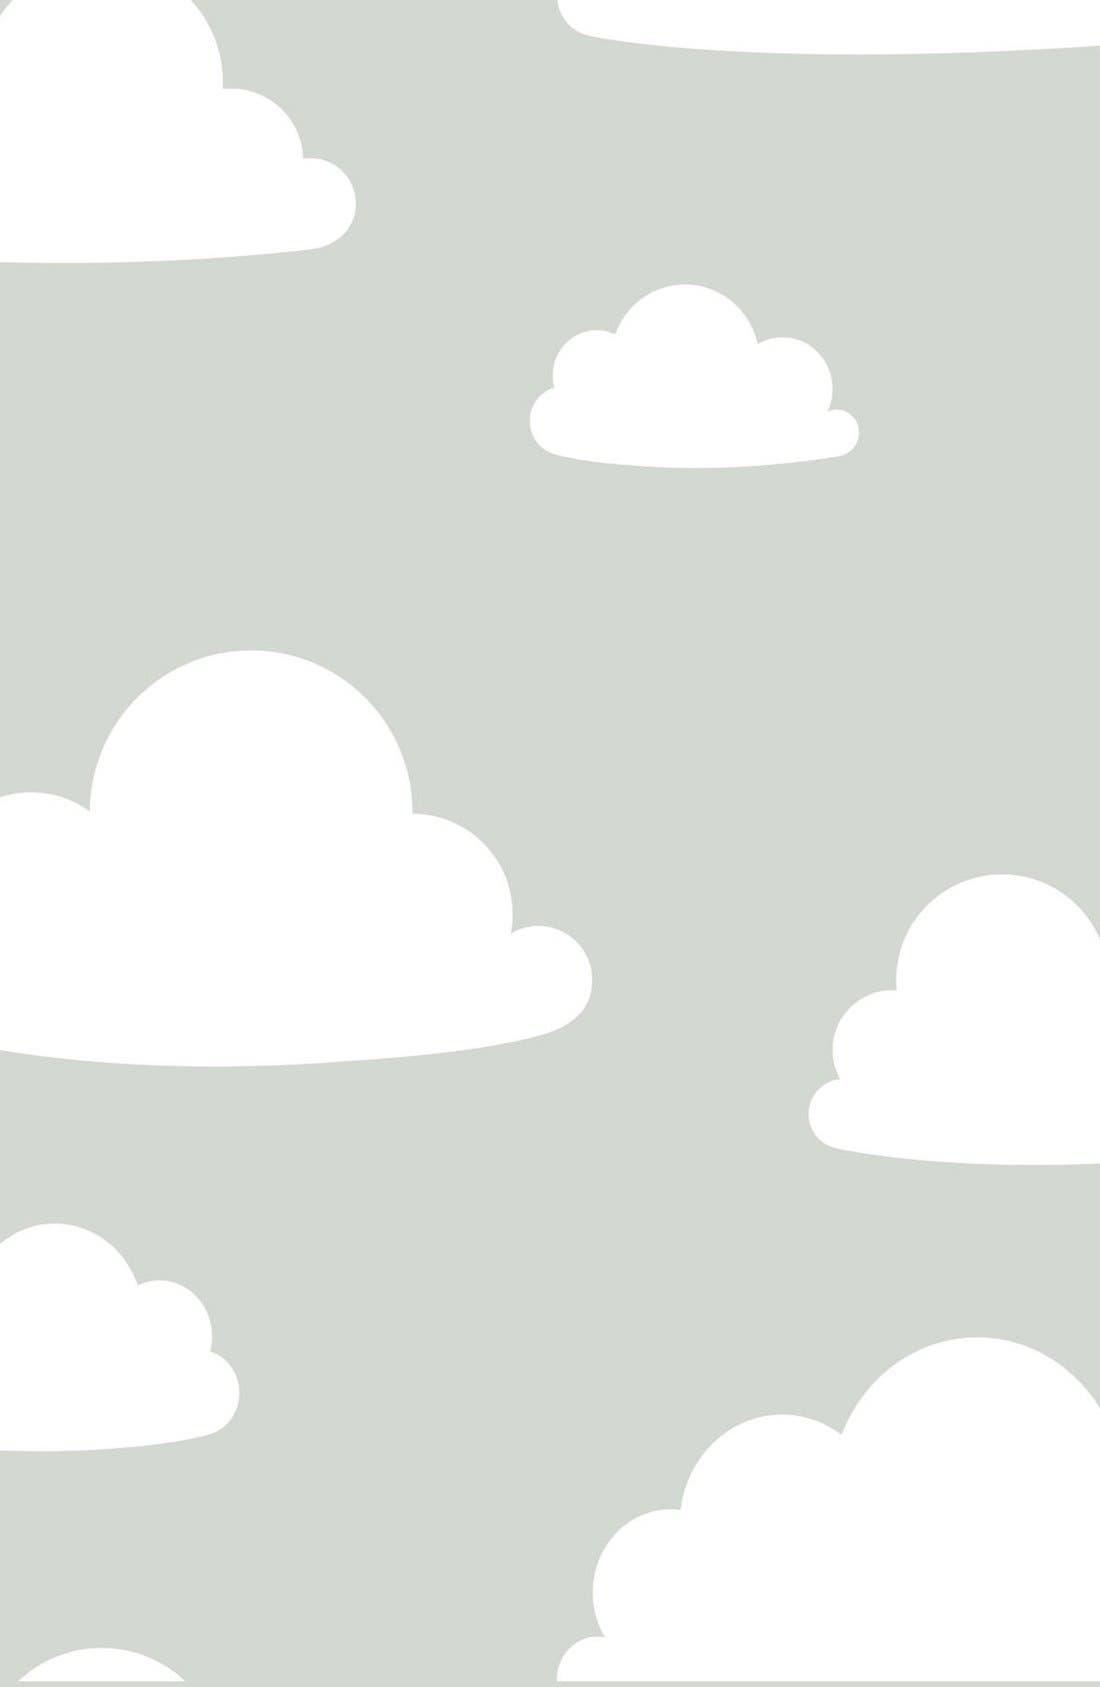 Main Image - Wallpops 'Clouds' Reusable Peel & Stick Vinyl Wallpaper